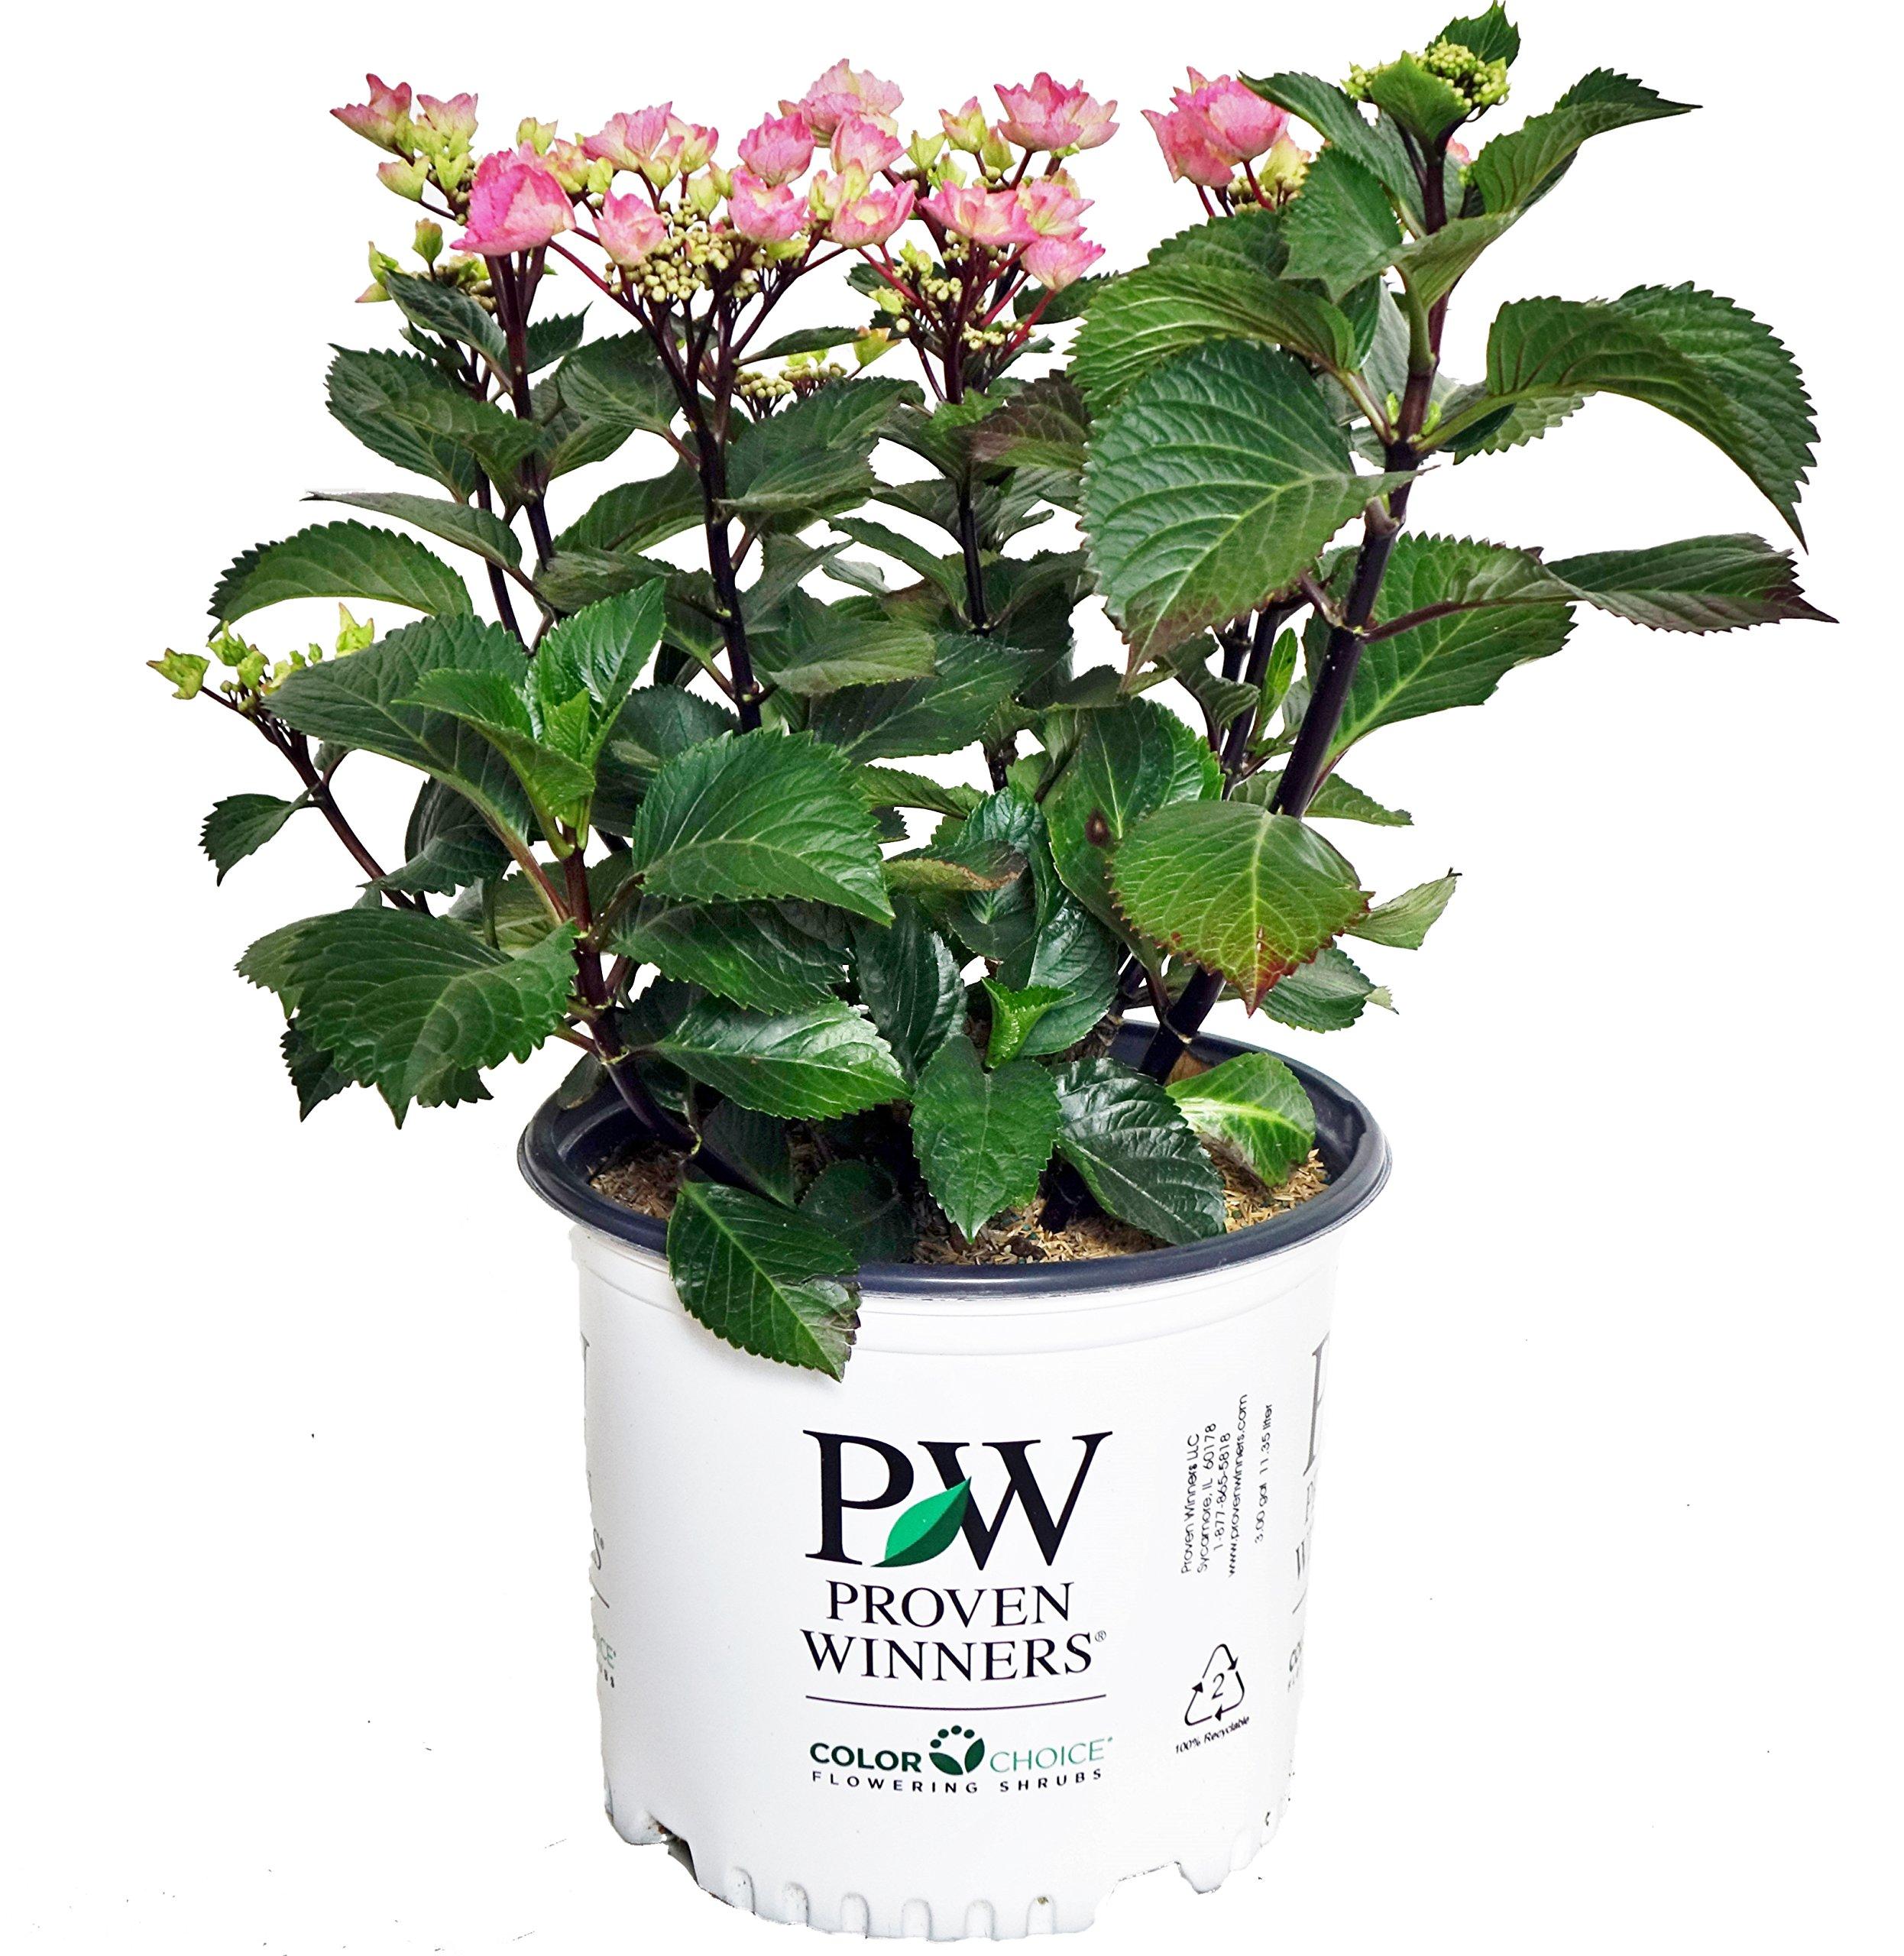 Proven Winners - Hydrangea mac. Abracadabra  Star (Bigleaf Hydrangea) Shrub, black stems with pink or blue flowers, #3 - Size Container